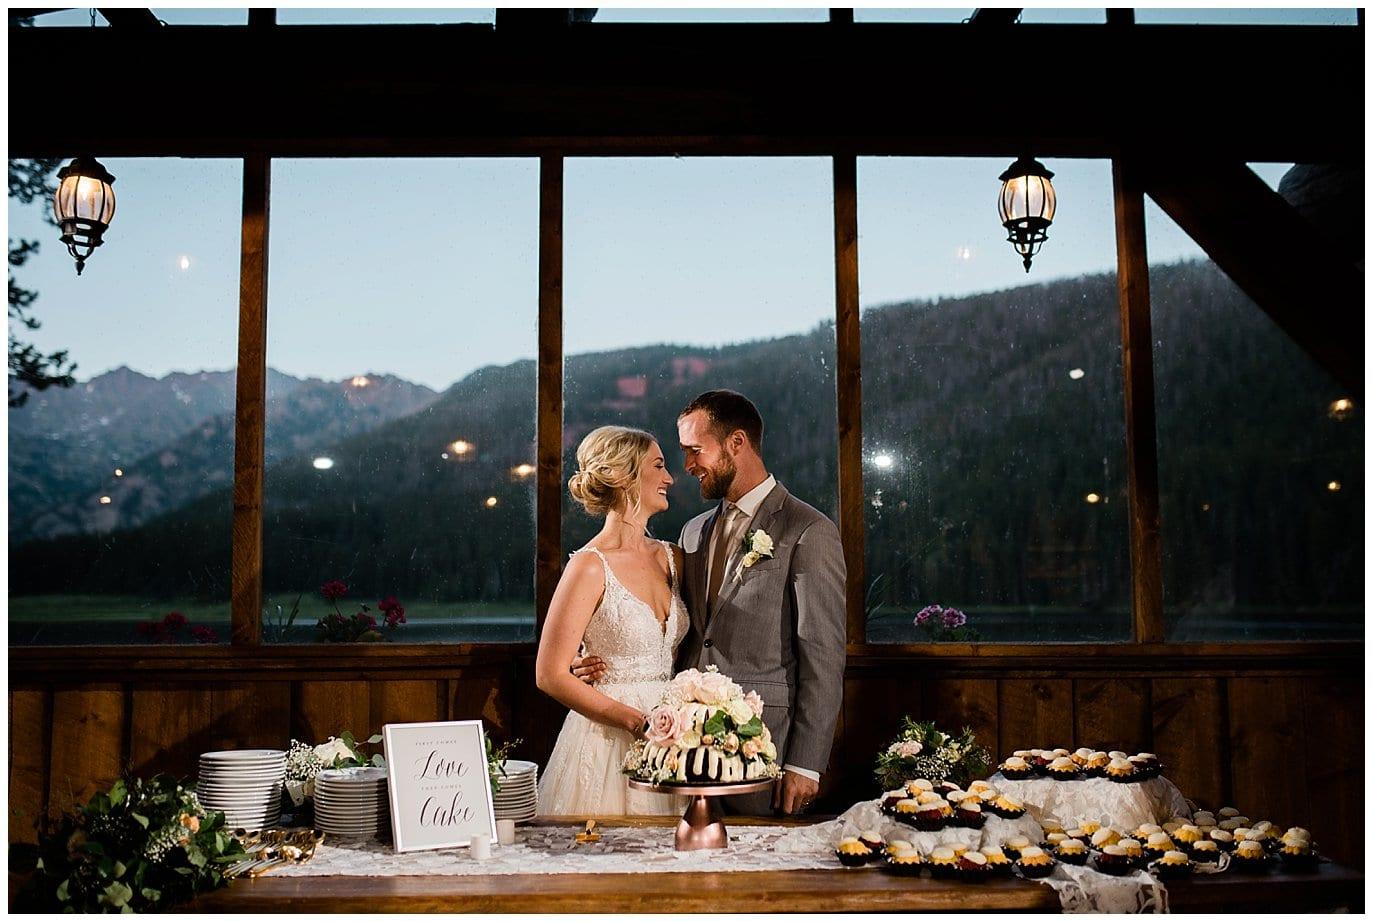 nothing bundt cakes wedding cake at Piney River Ranch wedding by Aspen wedding photographer Jennie Crate, Photographer